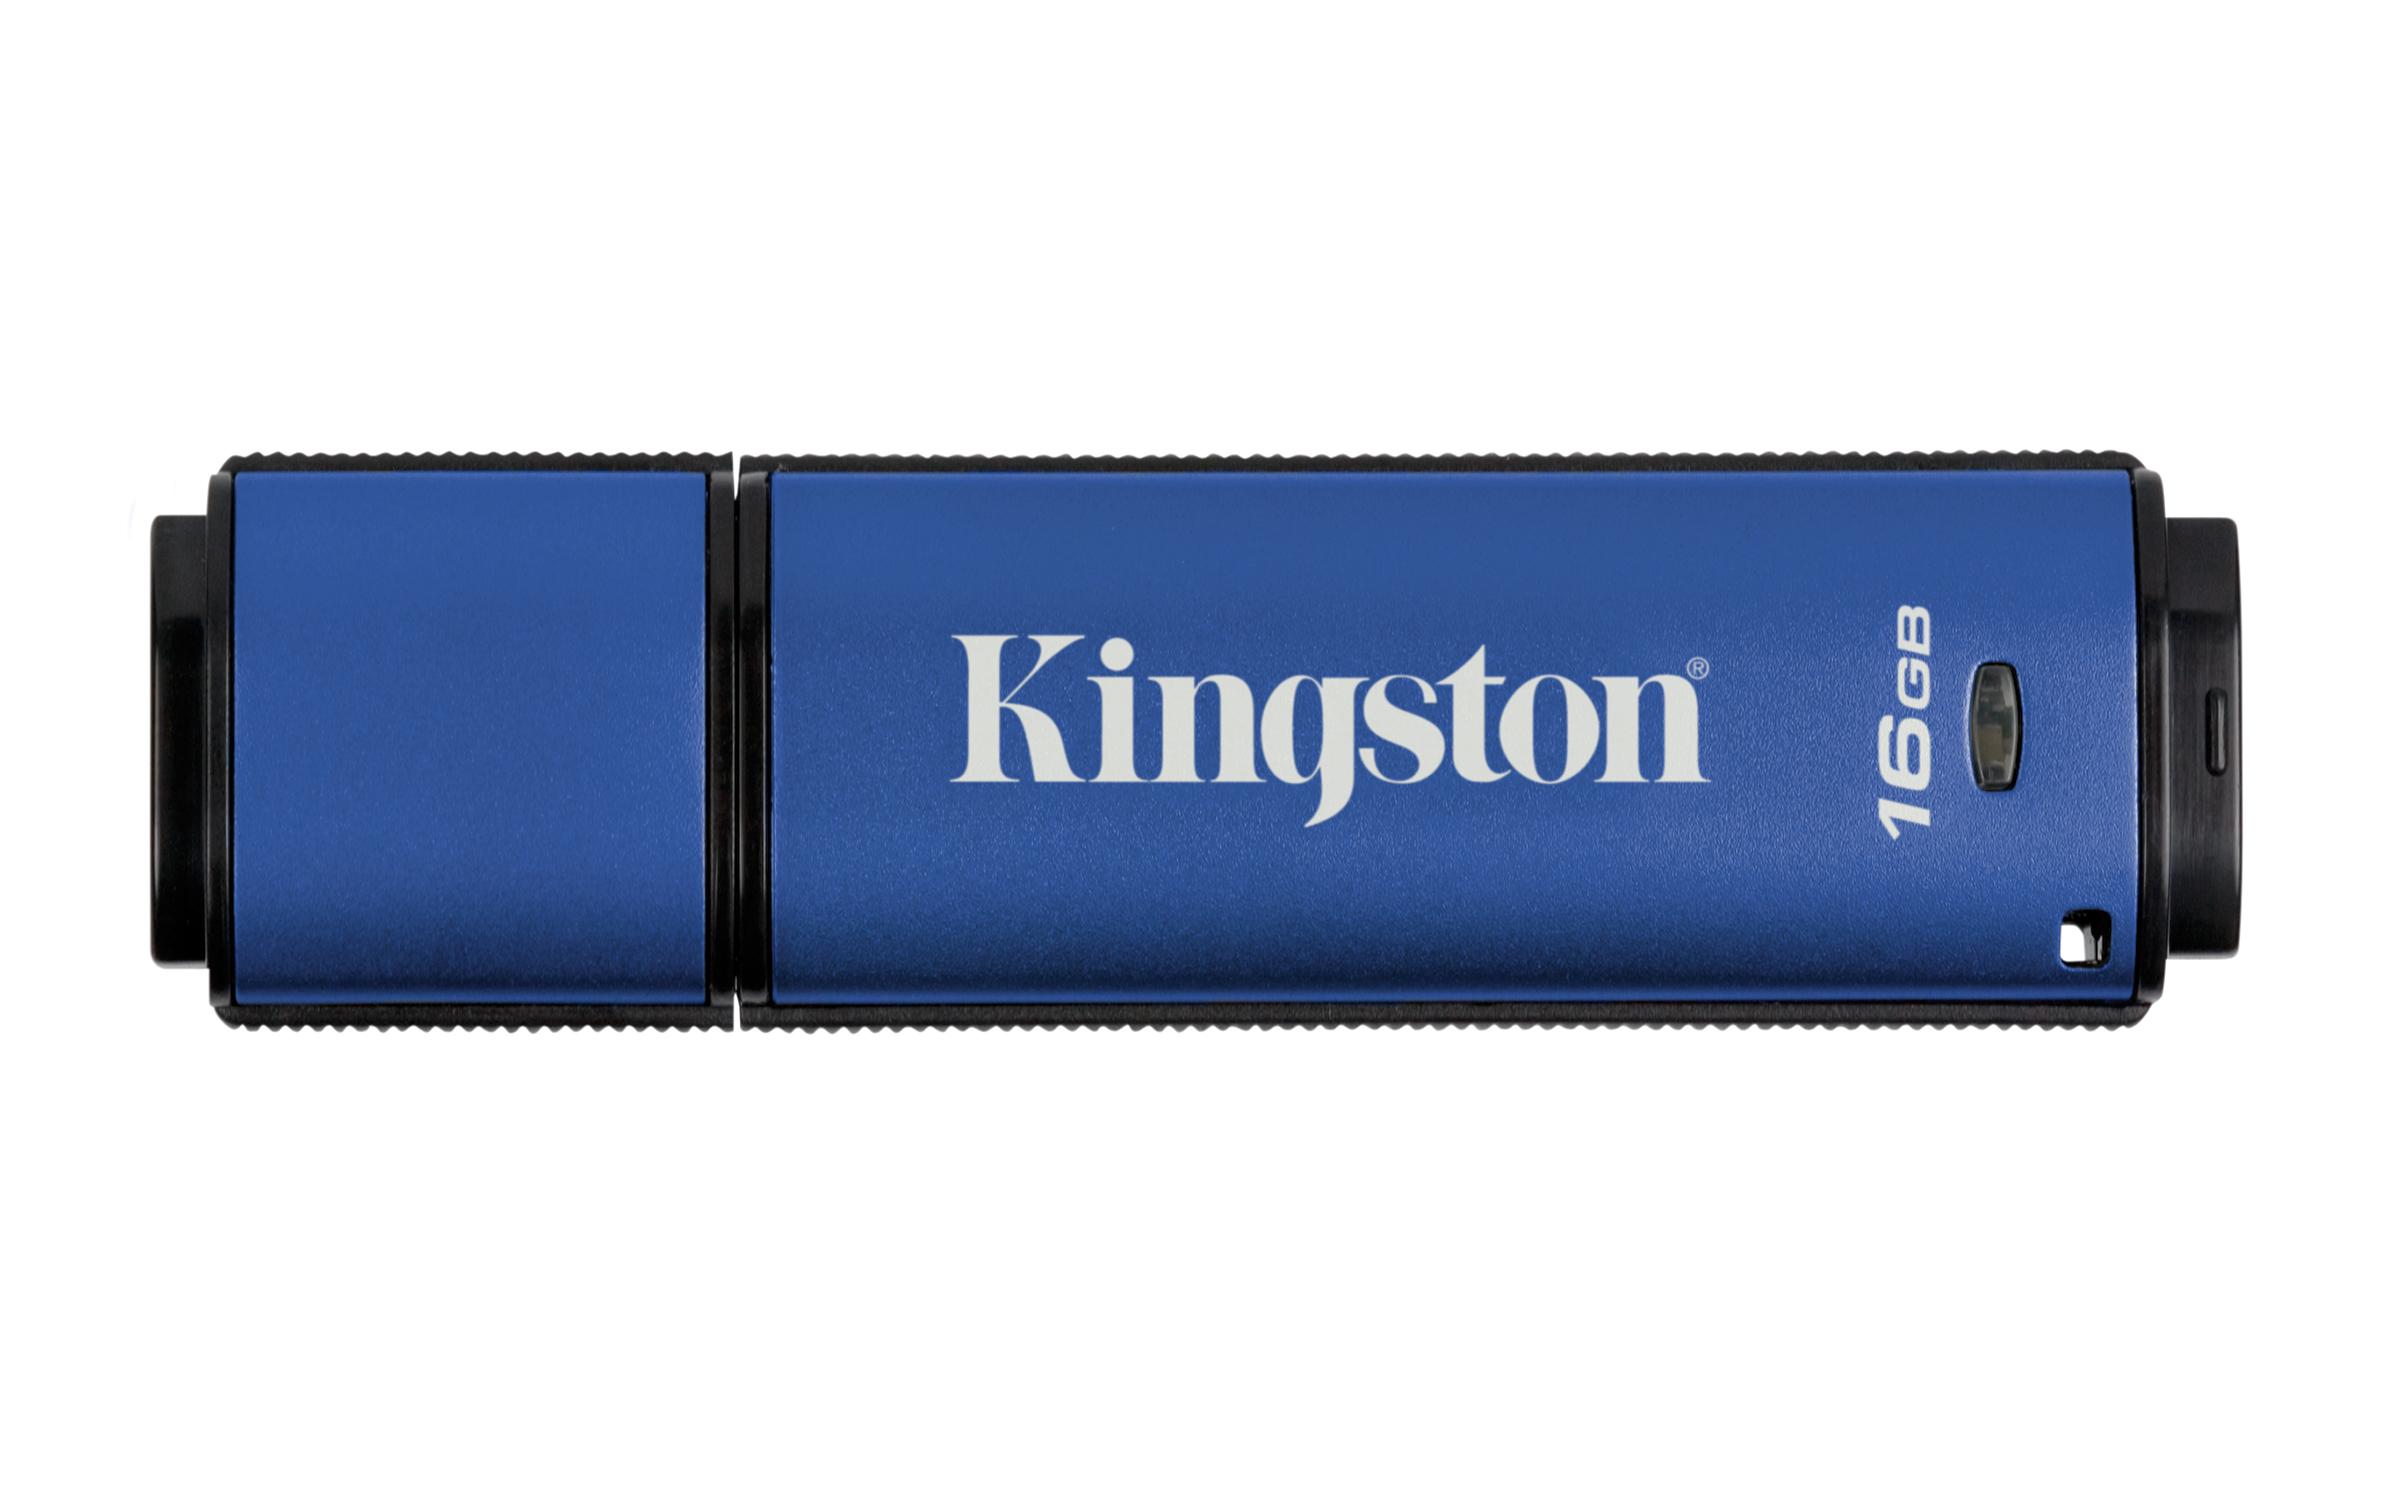 DTVP30 USB-Stick 16 GB (256-bit AES Encrypted, USB 3.0)